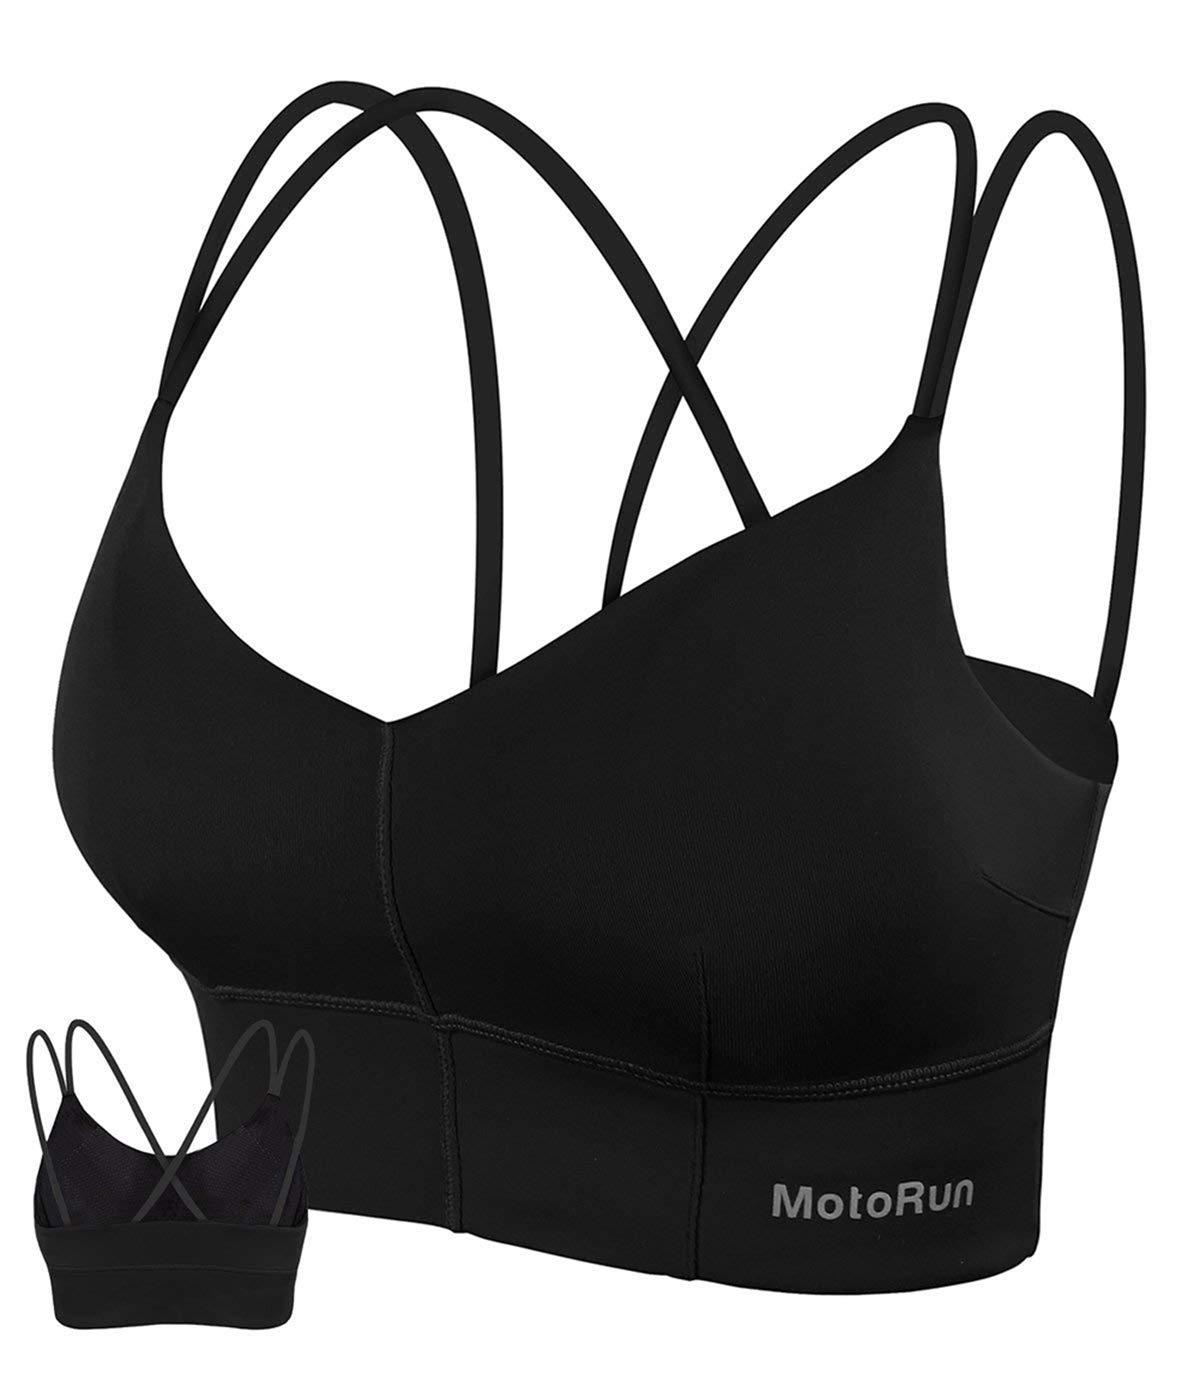 MotoRun Womens Push-up Padded Strappy Sports Bra Cross Back Wirefree Fitness Yoga Top Black S by MotoRun